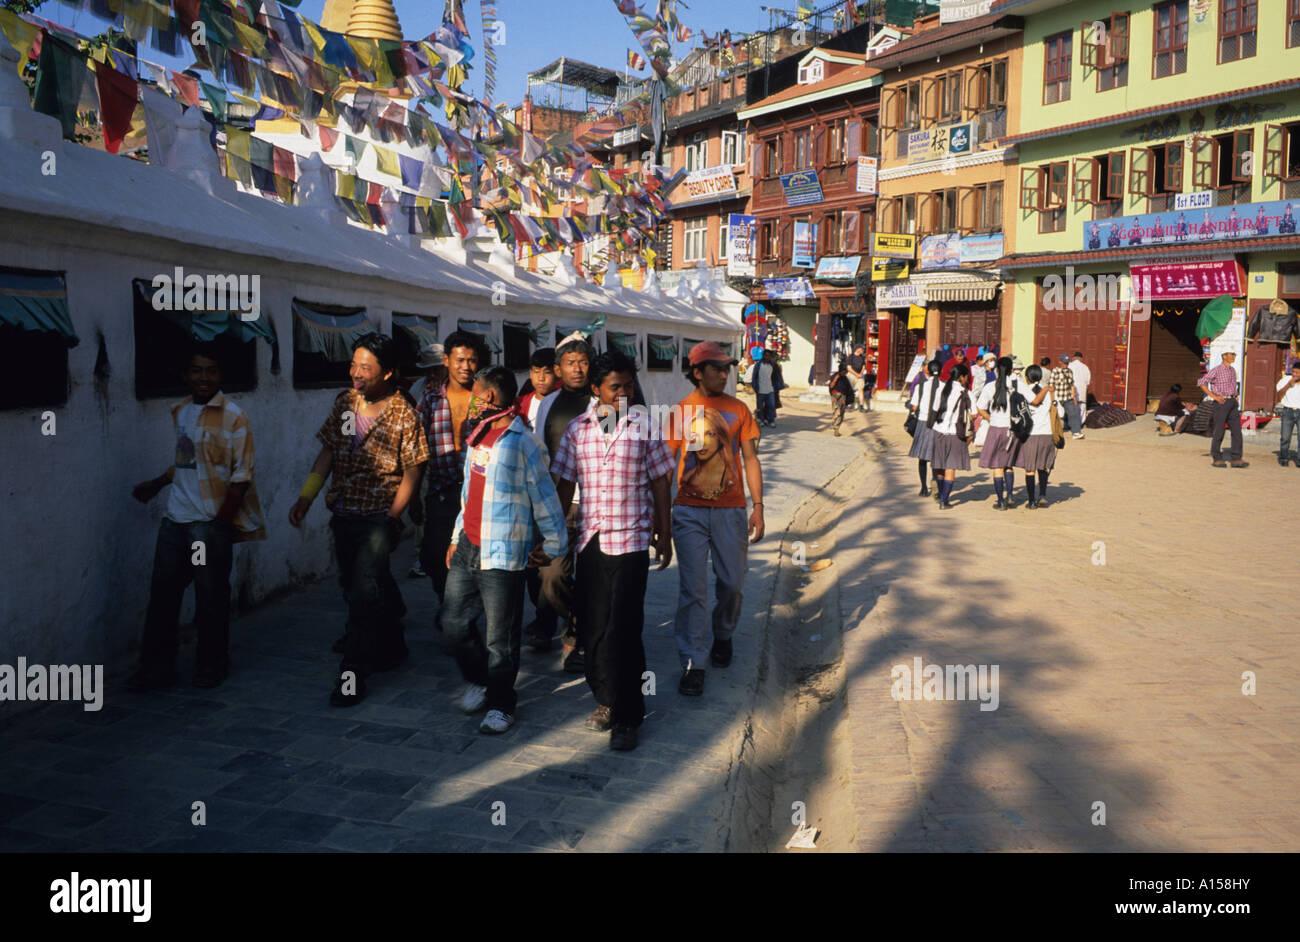 Bouddha Nath Stupa young men and women, Little Tibet, Kathmandu, Nepal Asia - Stock Image